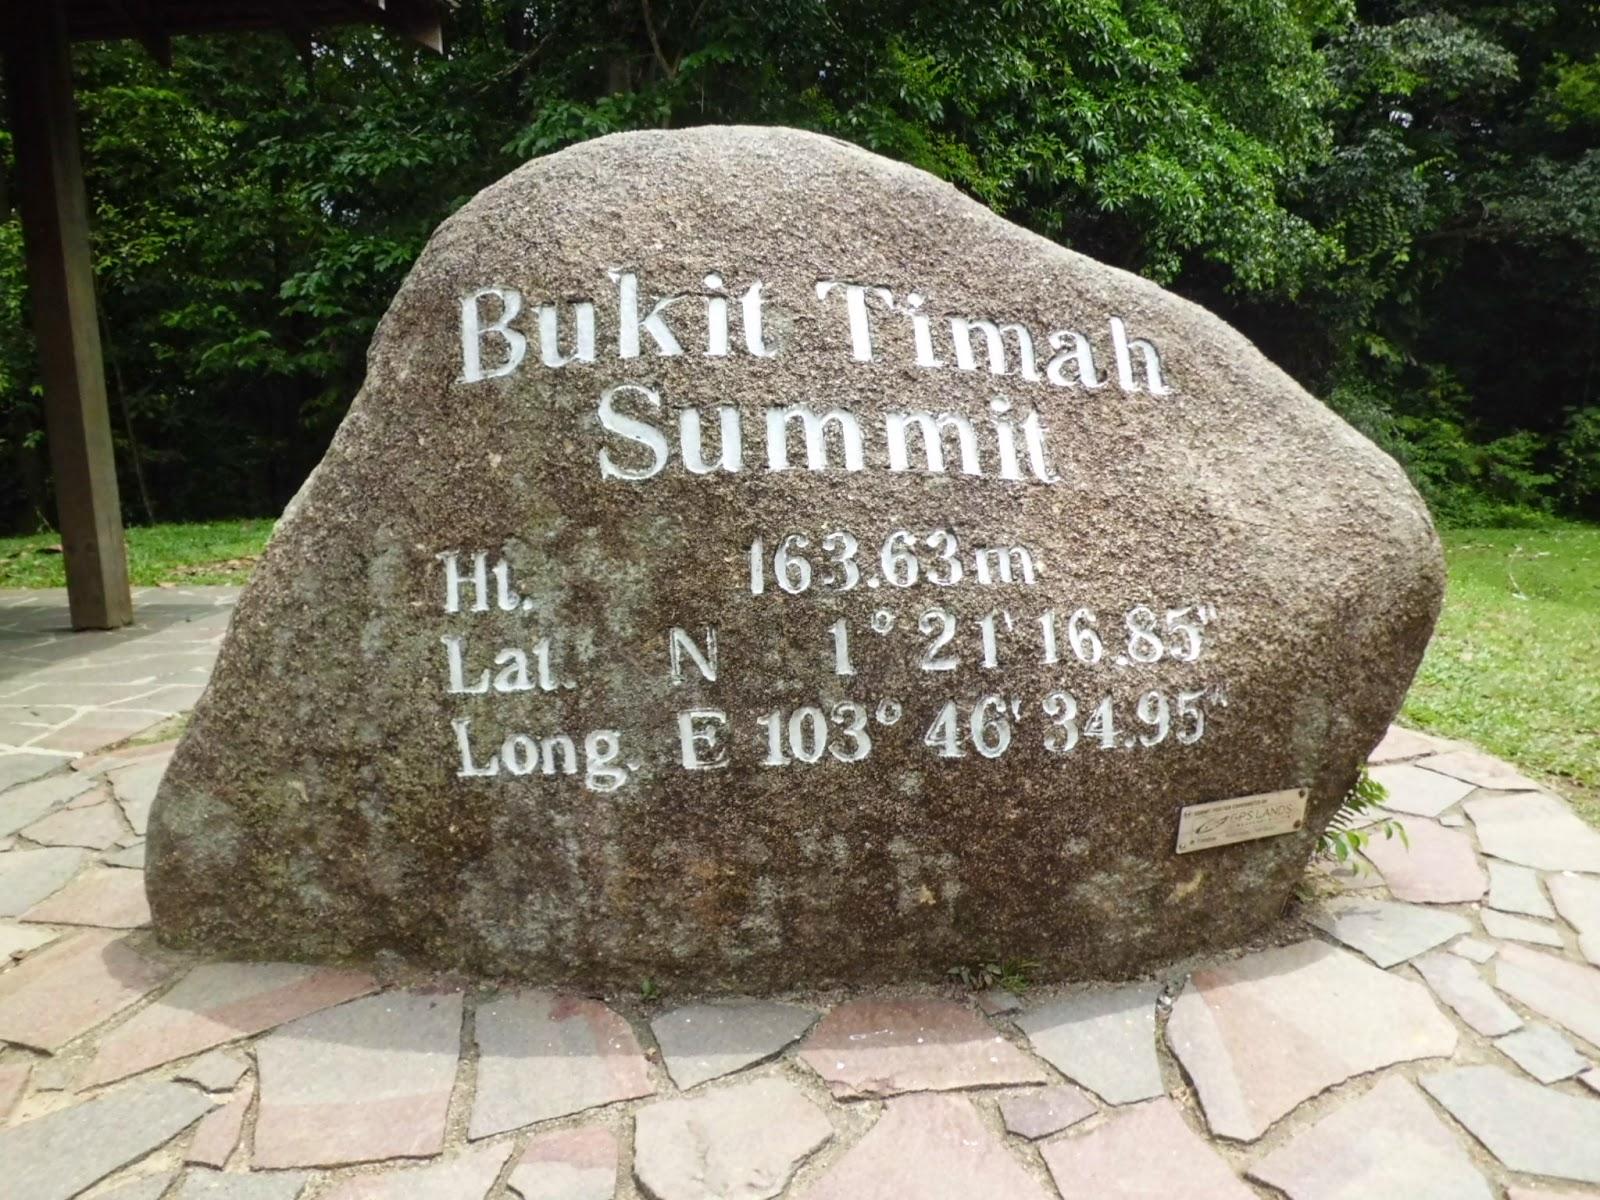 he Bukit Timah Nature Reserve Summit, 163.63m.